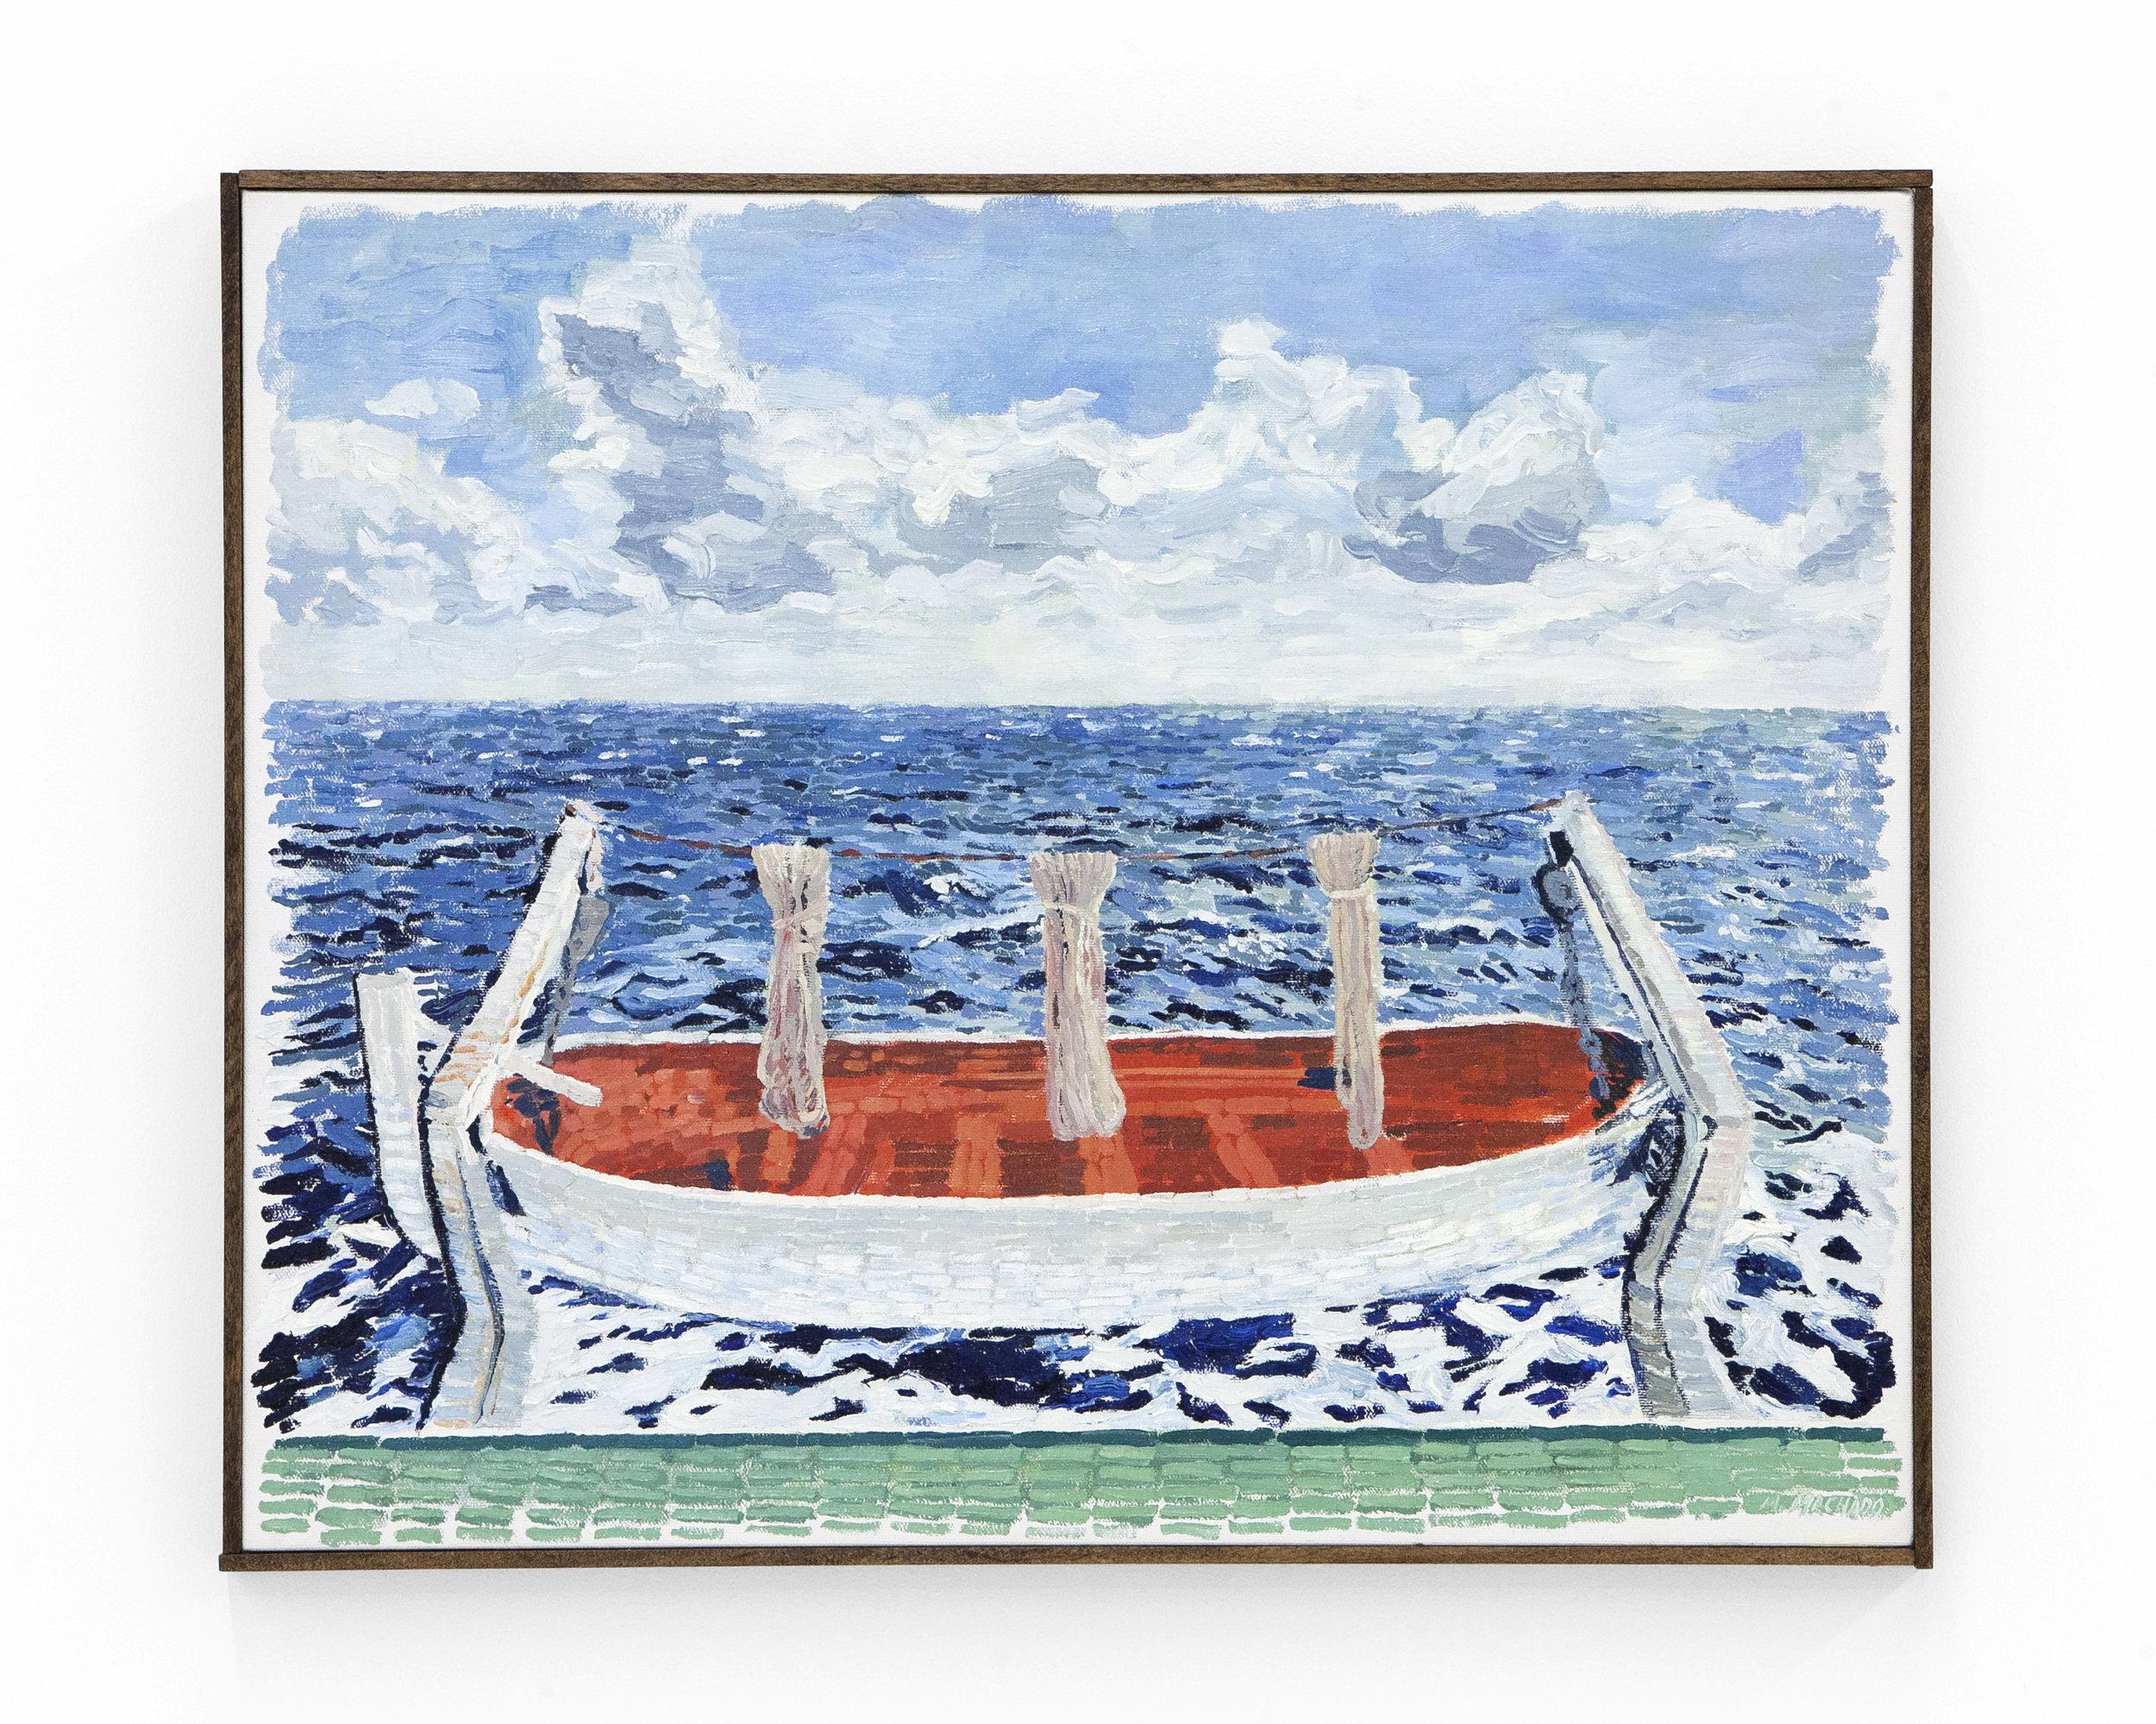 martinmachado_safeboat.jpg